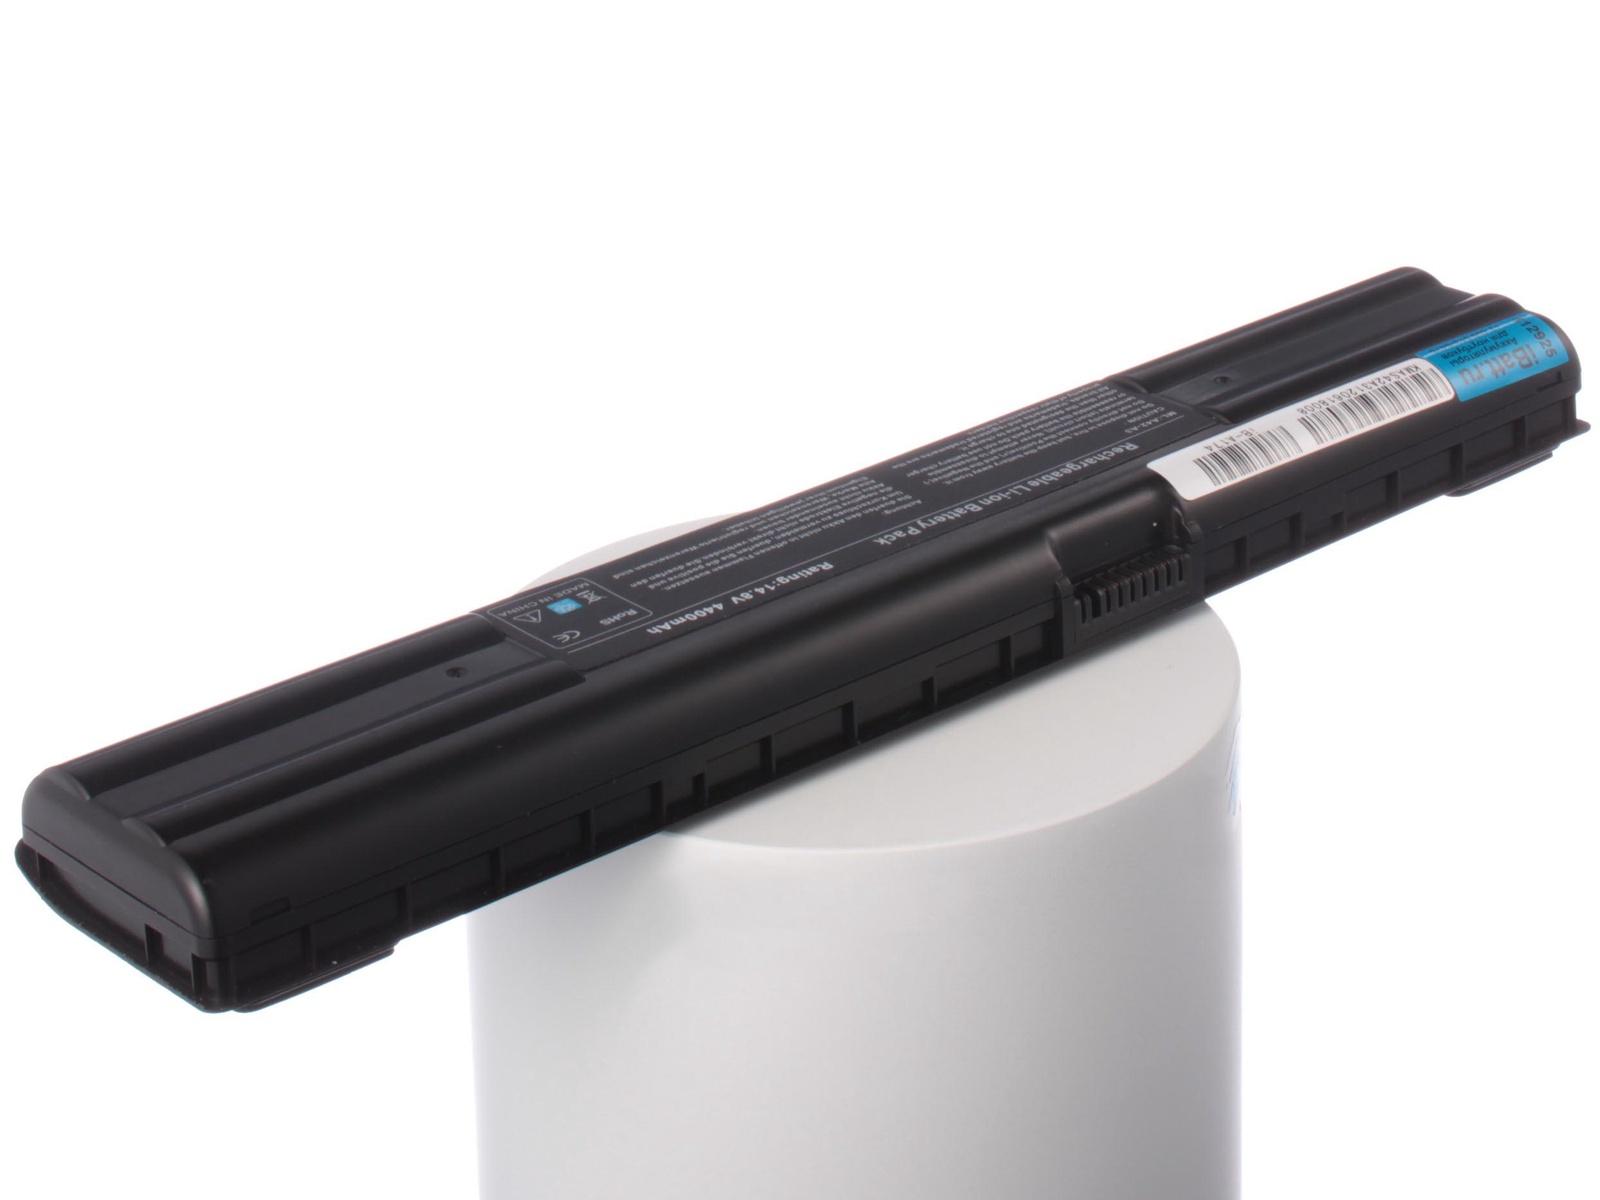 Аккумулятор для ноутбука iBatt Asus A42-A3, A42-A6, A41-A6, A41-A3, 70-NA51B1100, 90-NFPCB2001 все цены